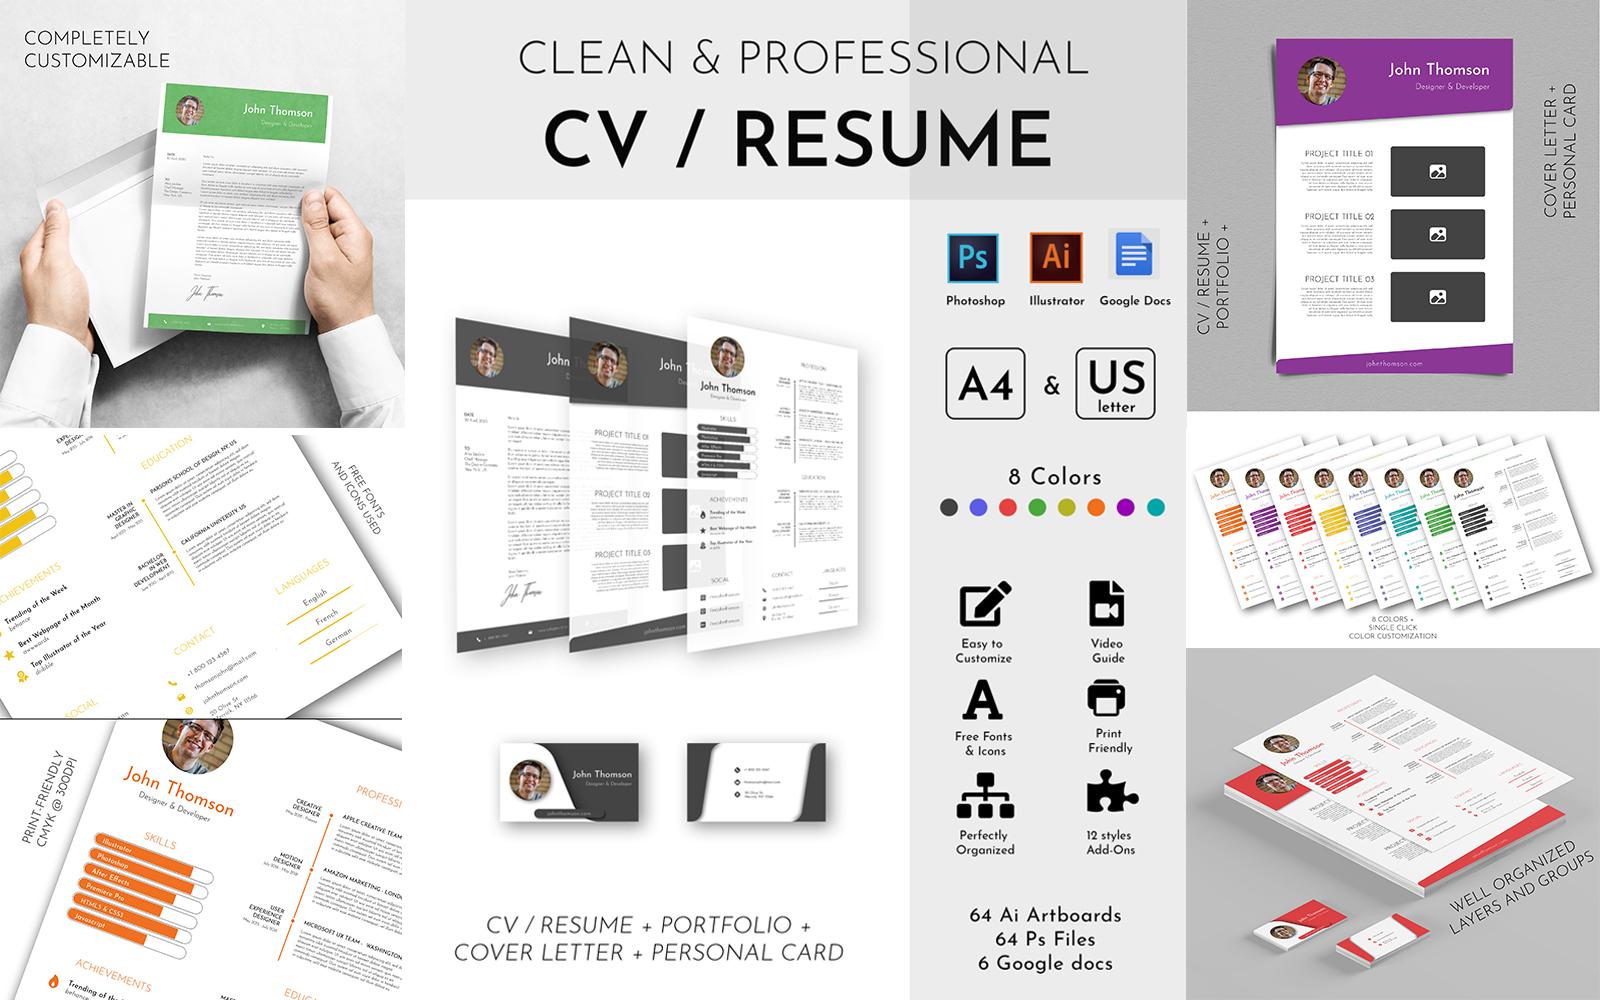 Clean & Professional CV Resume Template